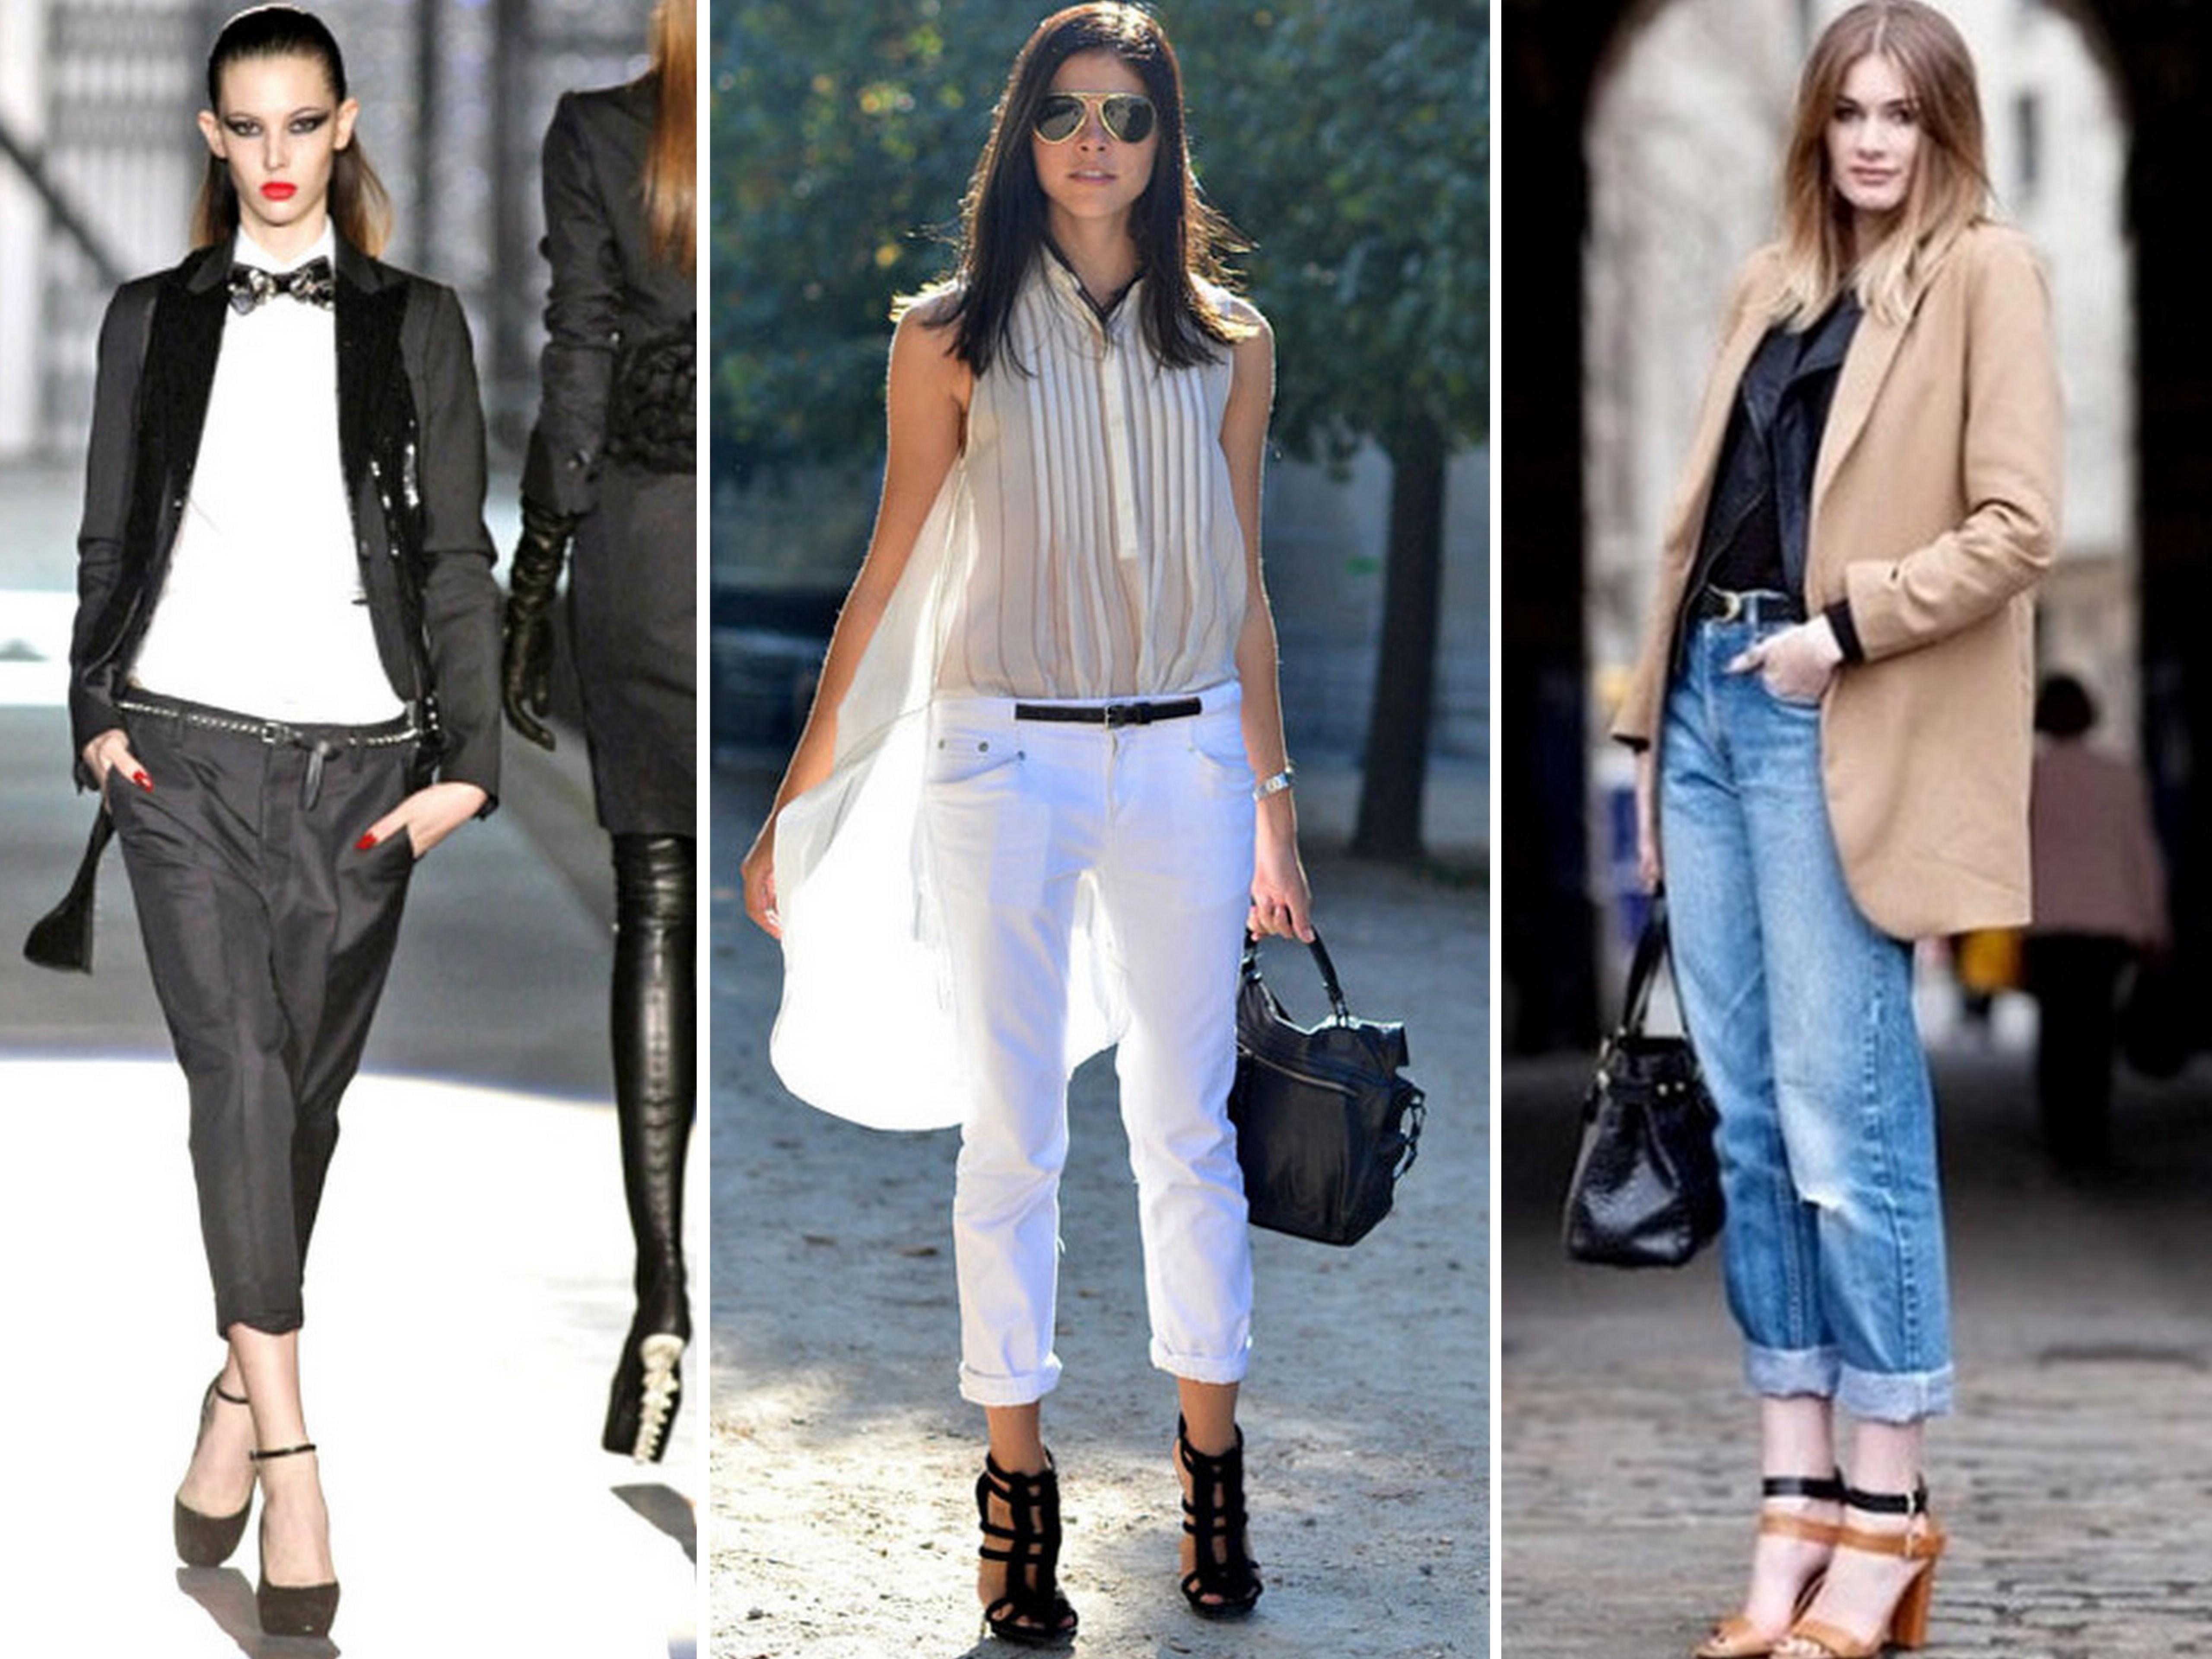 Estiliza Tu Figura Con Los Pantalones Capri Mucha Mas Moda Mucha Mas Moda